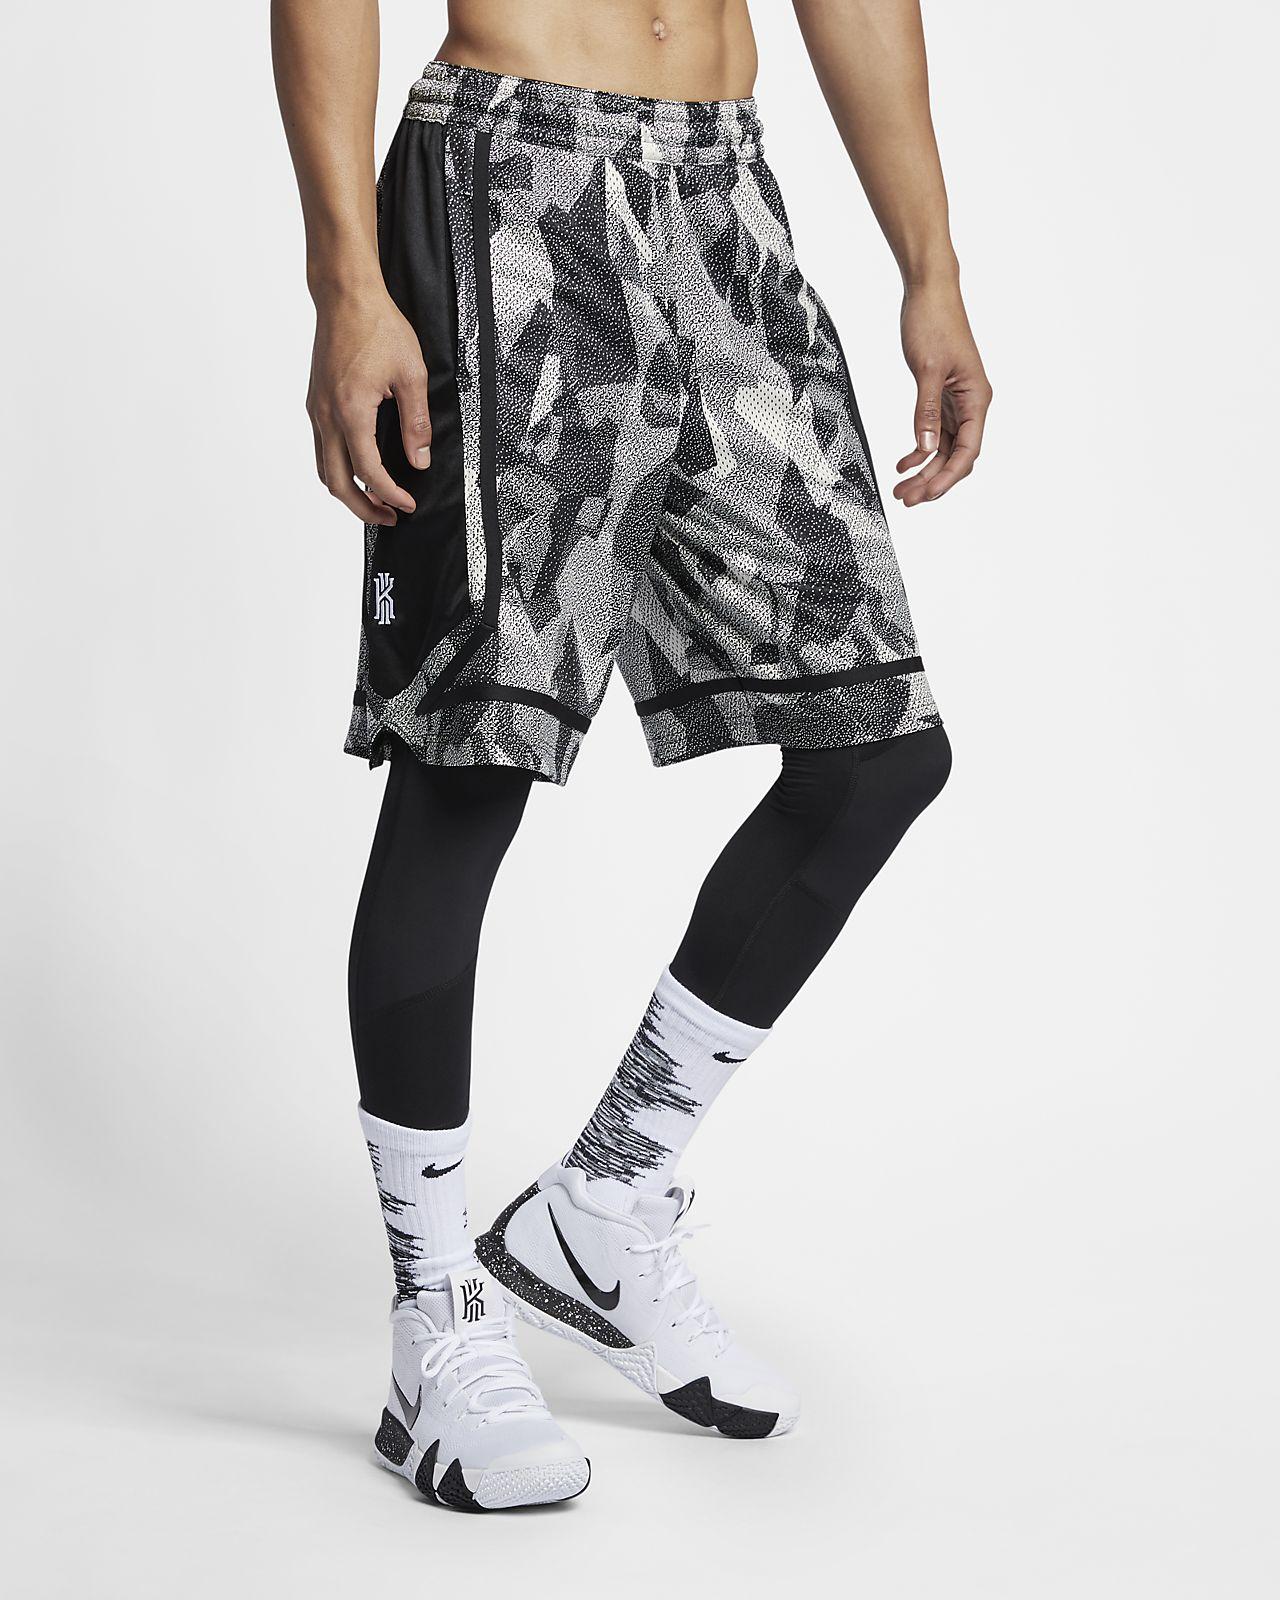 a2d9bcede83c Kyrie Dri-FIT Elite Men s Basketball Shorts. Nike.com NZ